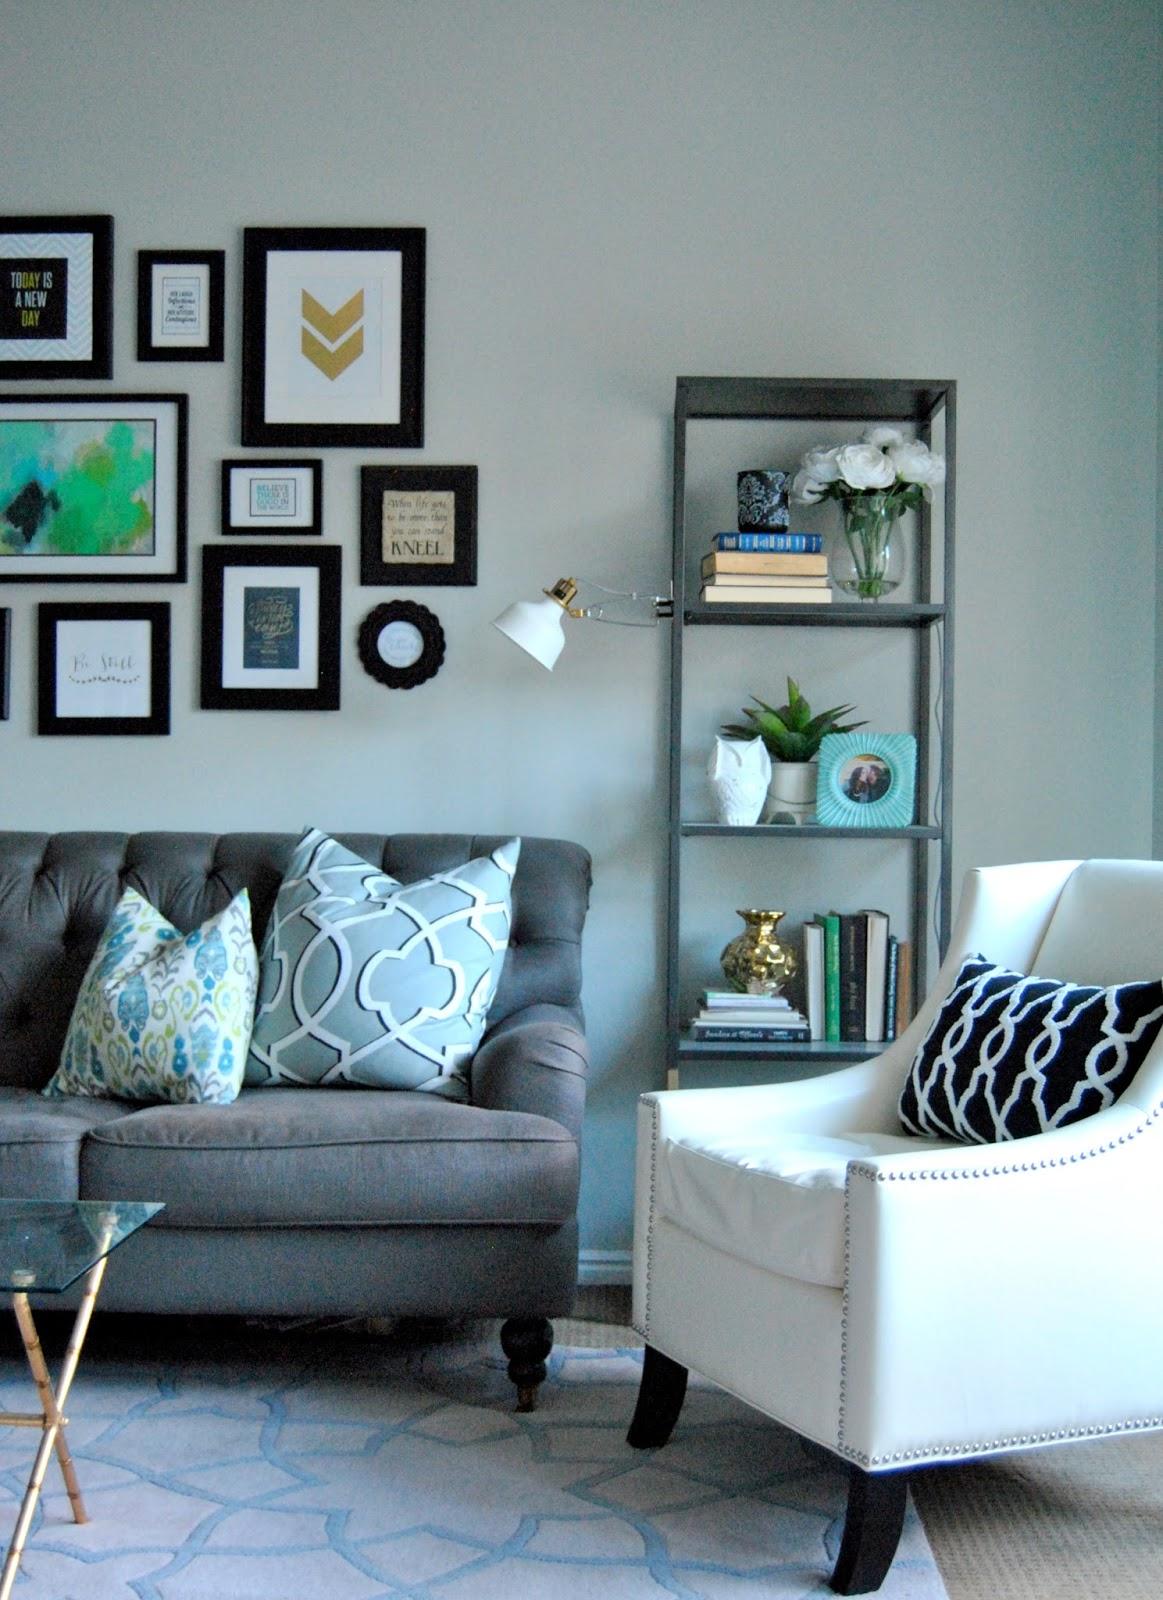 Grey Club Chair Wheelchair Gang Studio 7 Interior Design: Shop These Rooms...